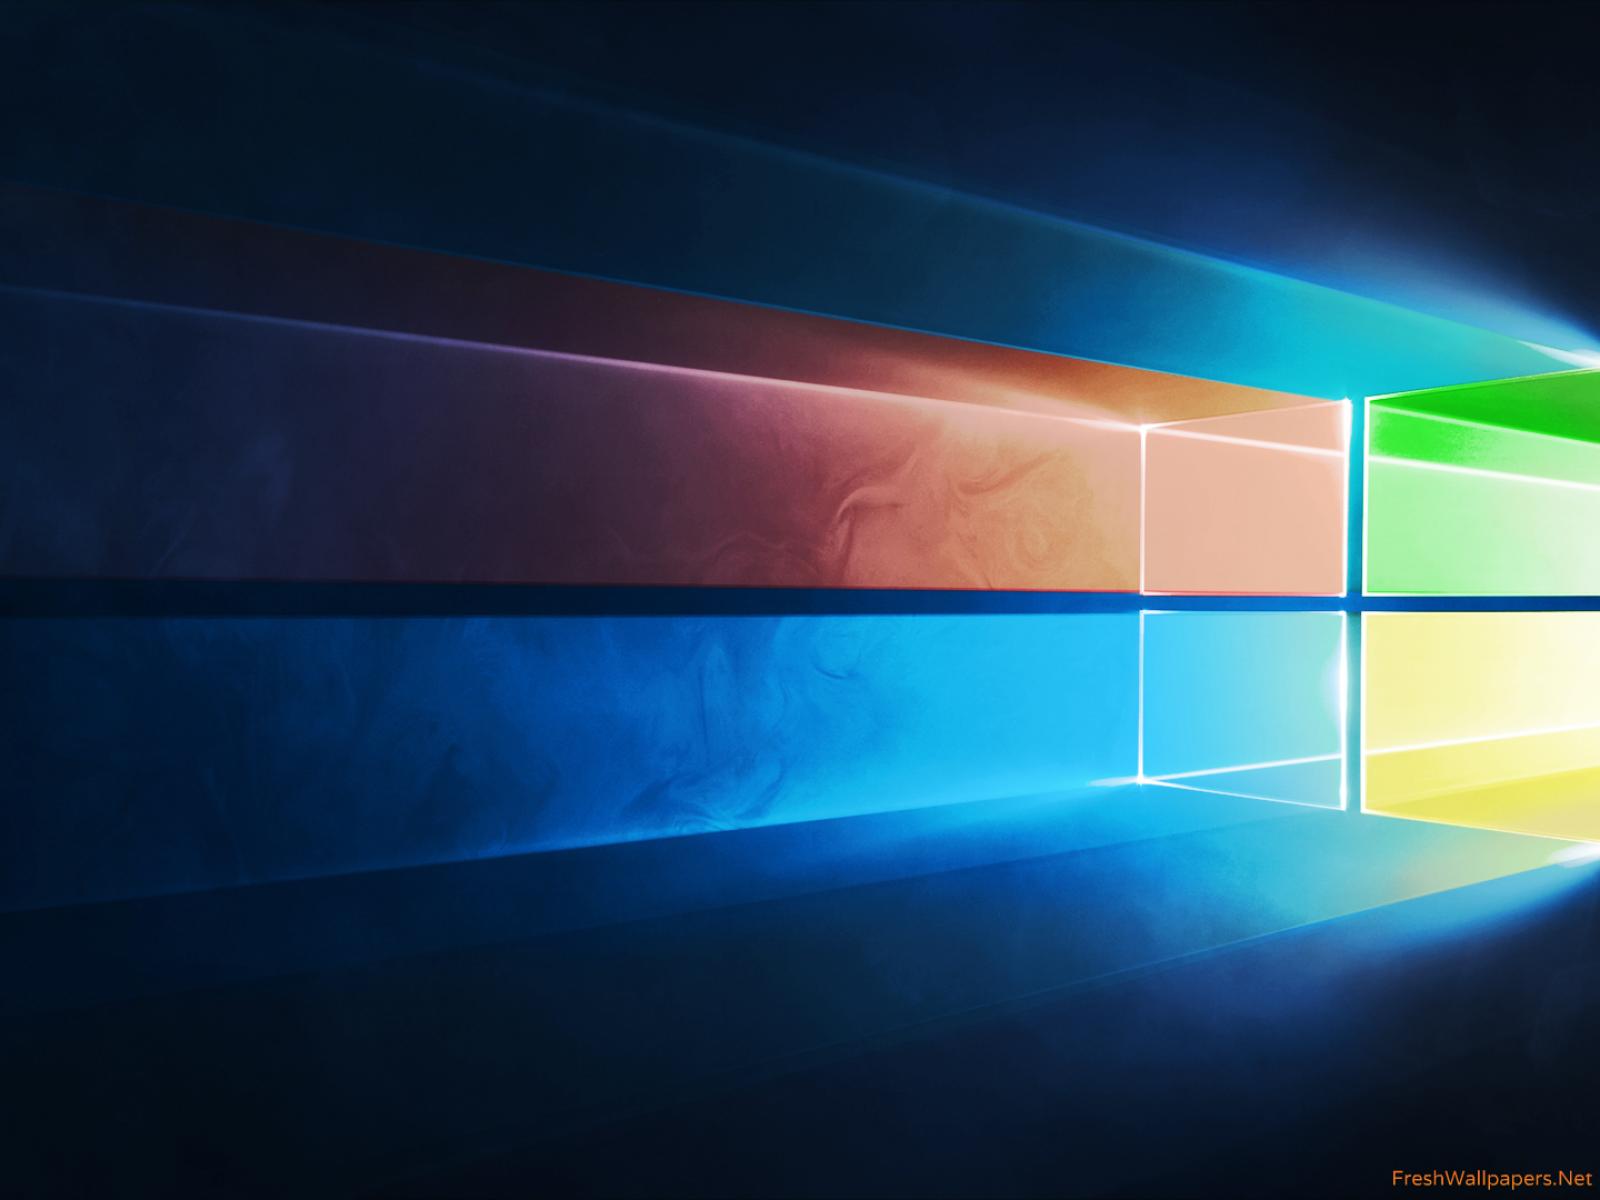 Windows 10 1080p Wallpapers Wallpaper HD Desktop 1600x1200 px 2.13 MB | Imagens bonitas ...